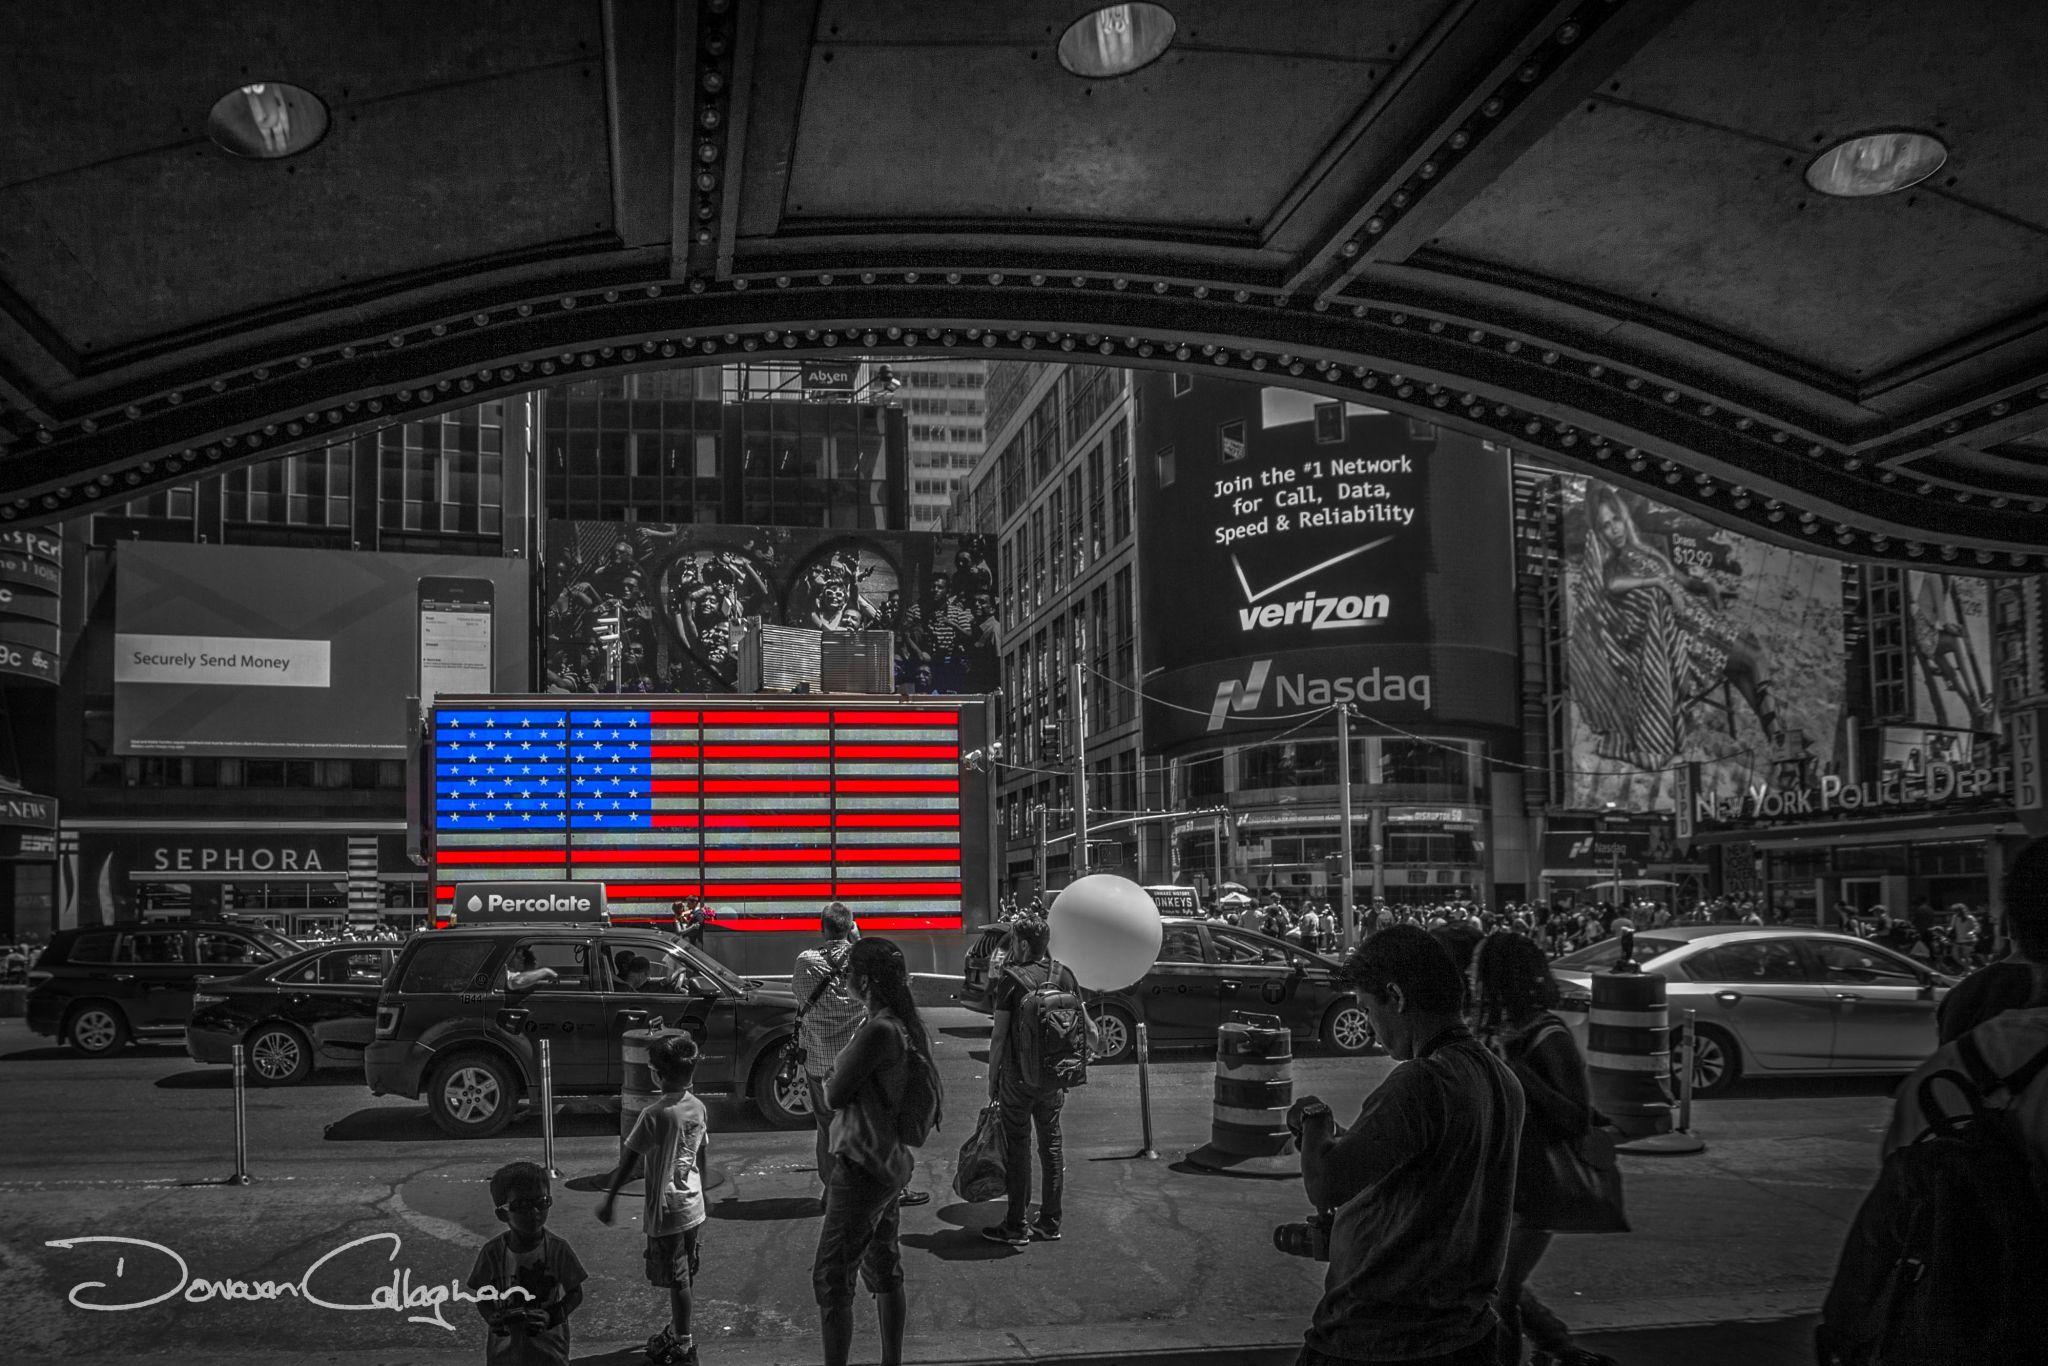 Times Square flag, USA